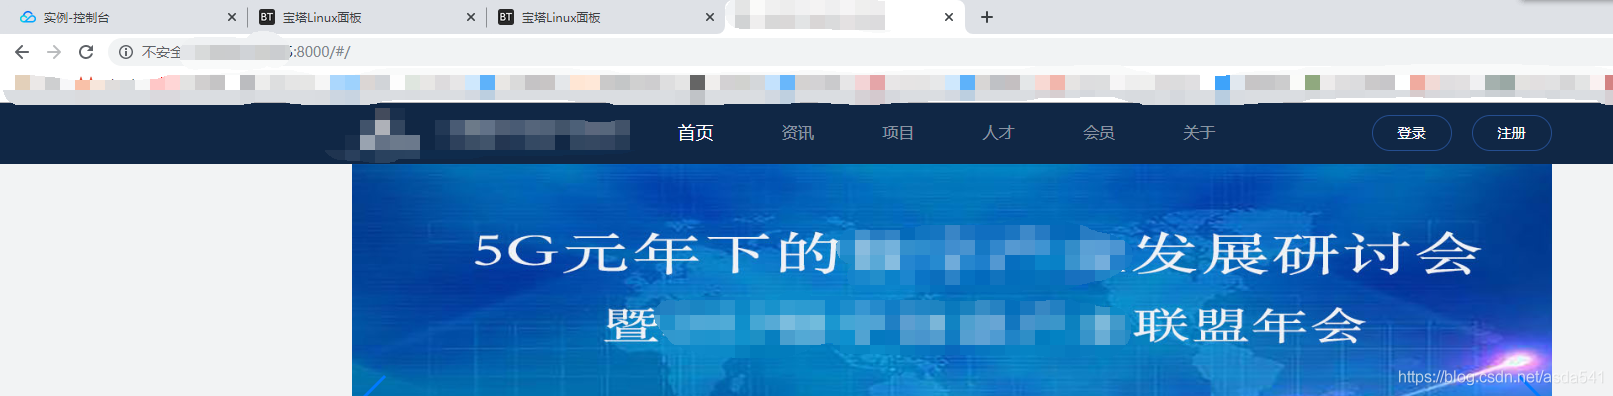 IP+端口访问